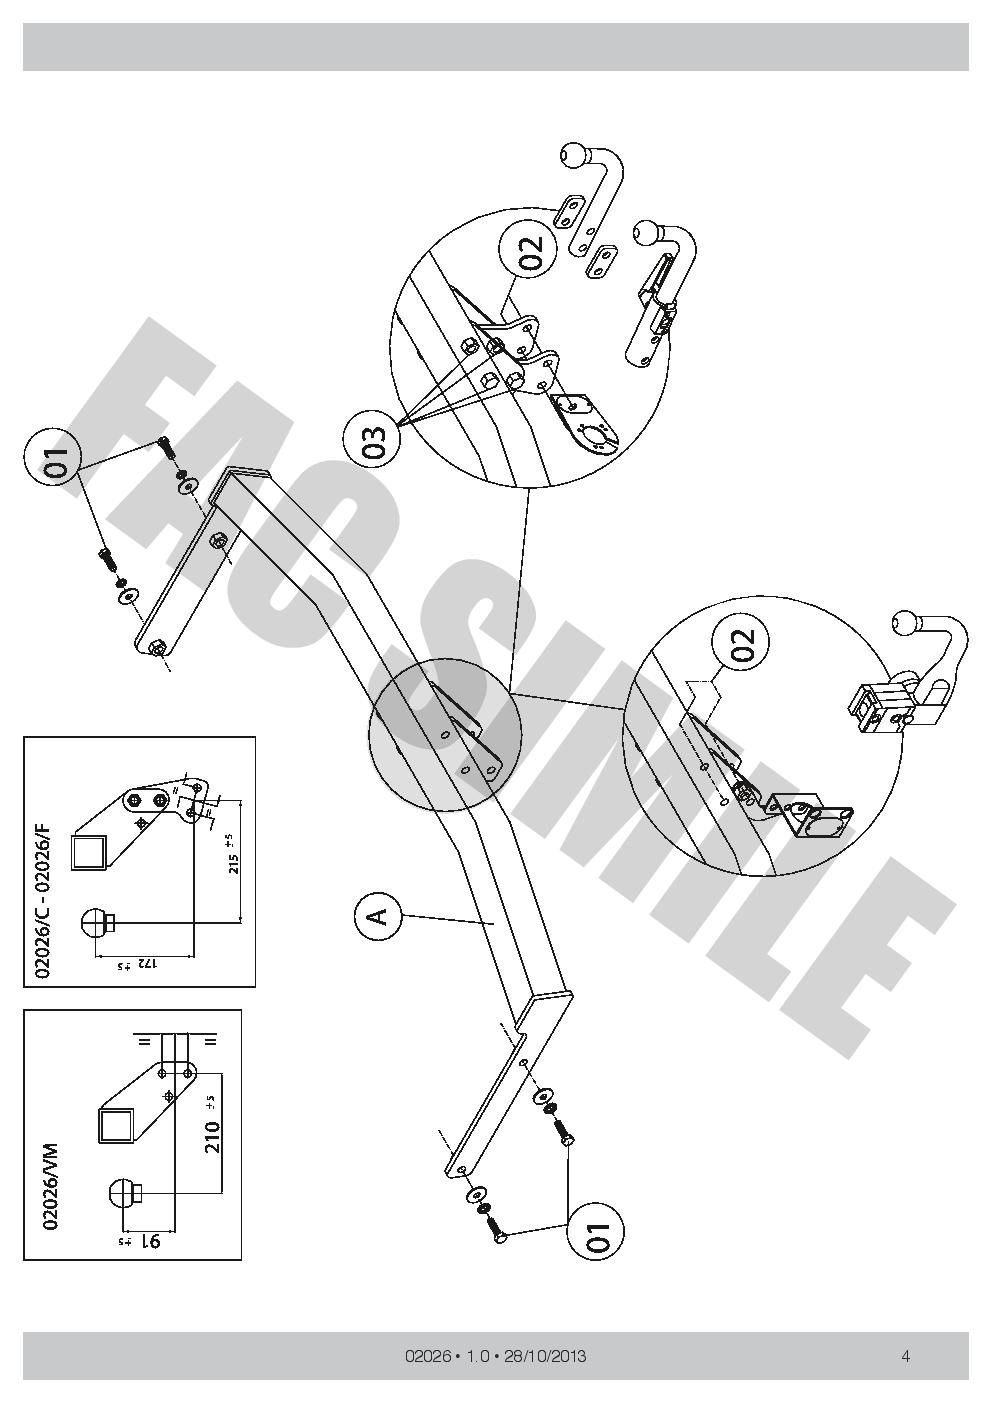 Anhängerkupplung Abnehmbare Audi A3 Sportback 5 Türer 04-13 02026 AHK 7p E-Satz